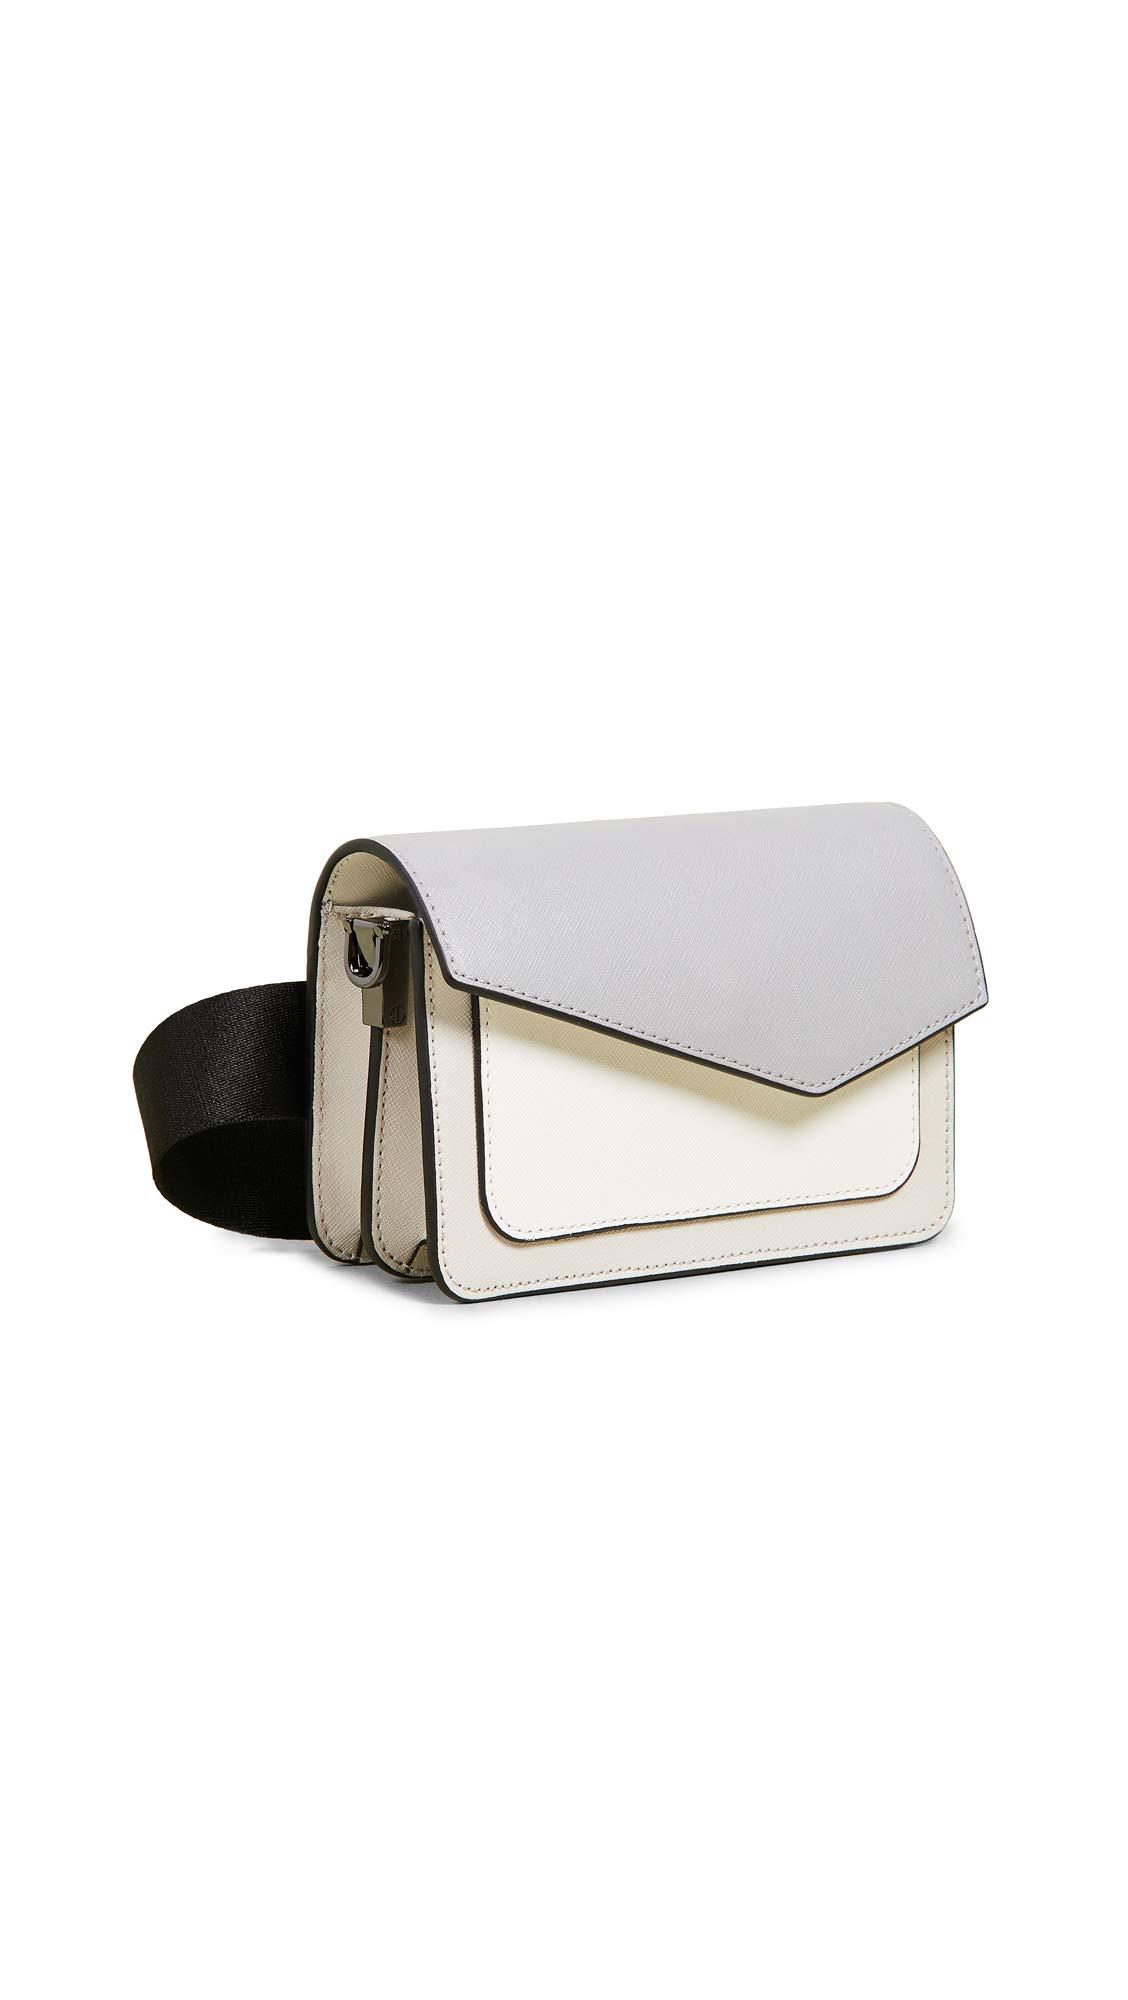 Botkier Women's Cobble Hill Belt Bag, Dove Colorblock, Grey, One Size